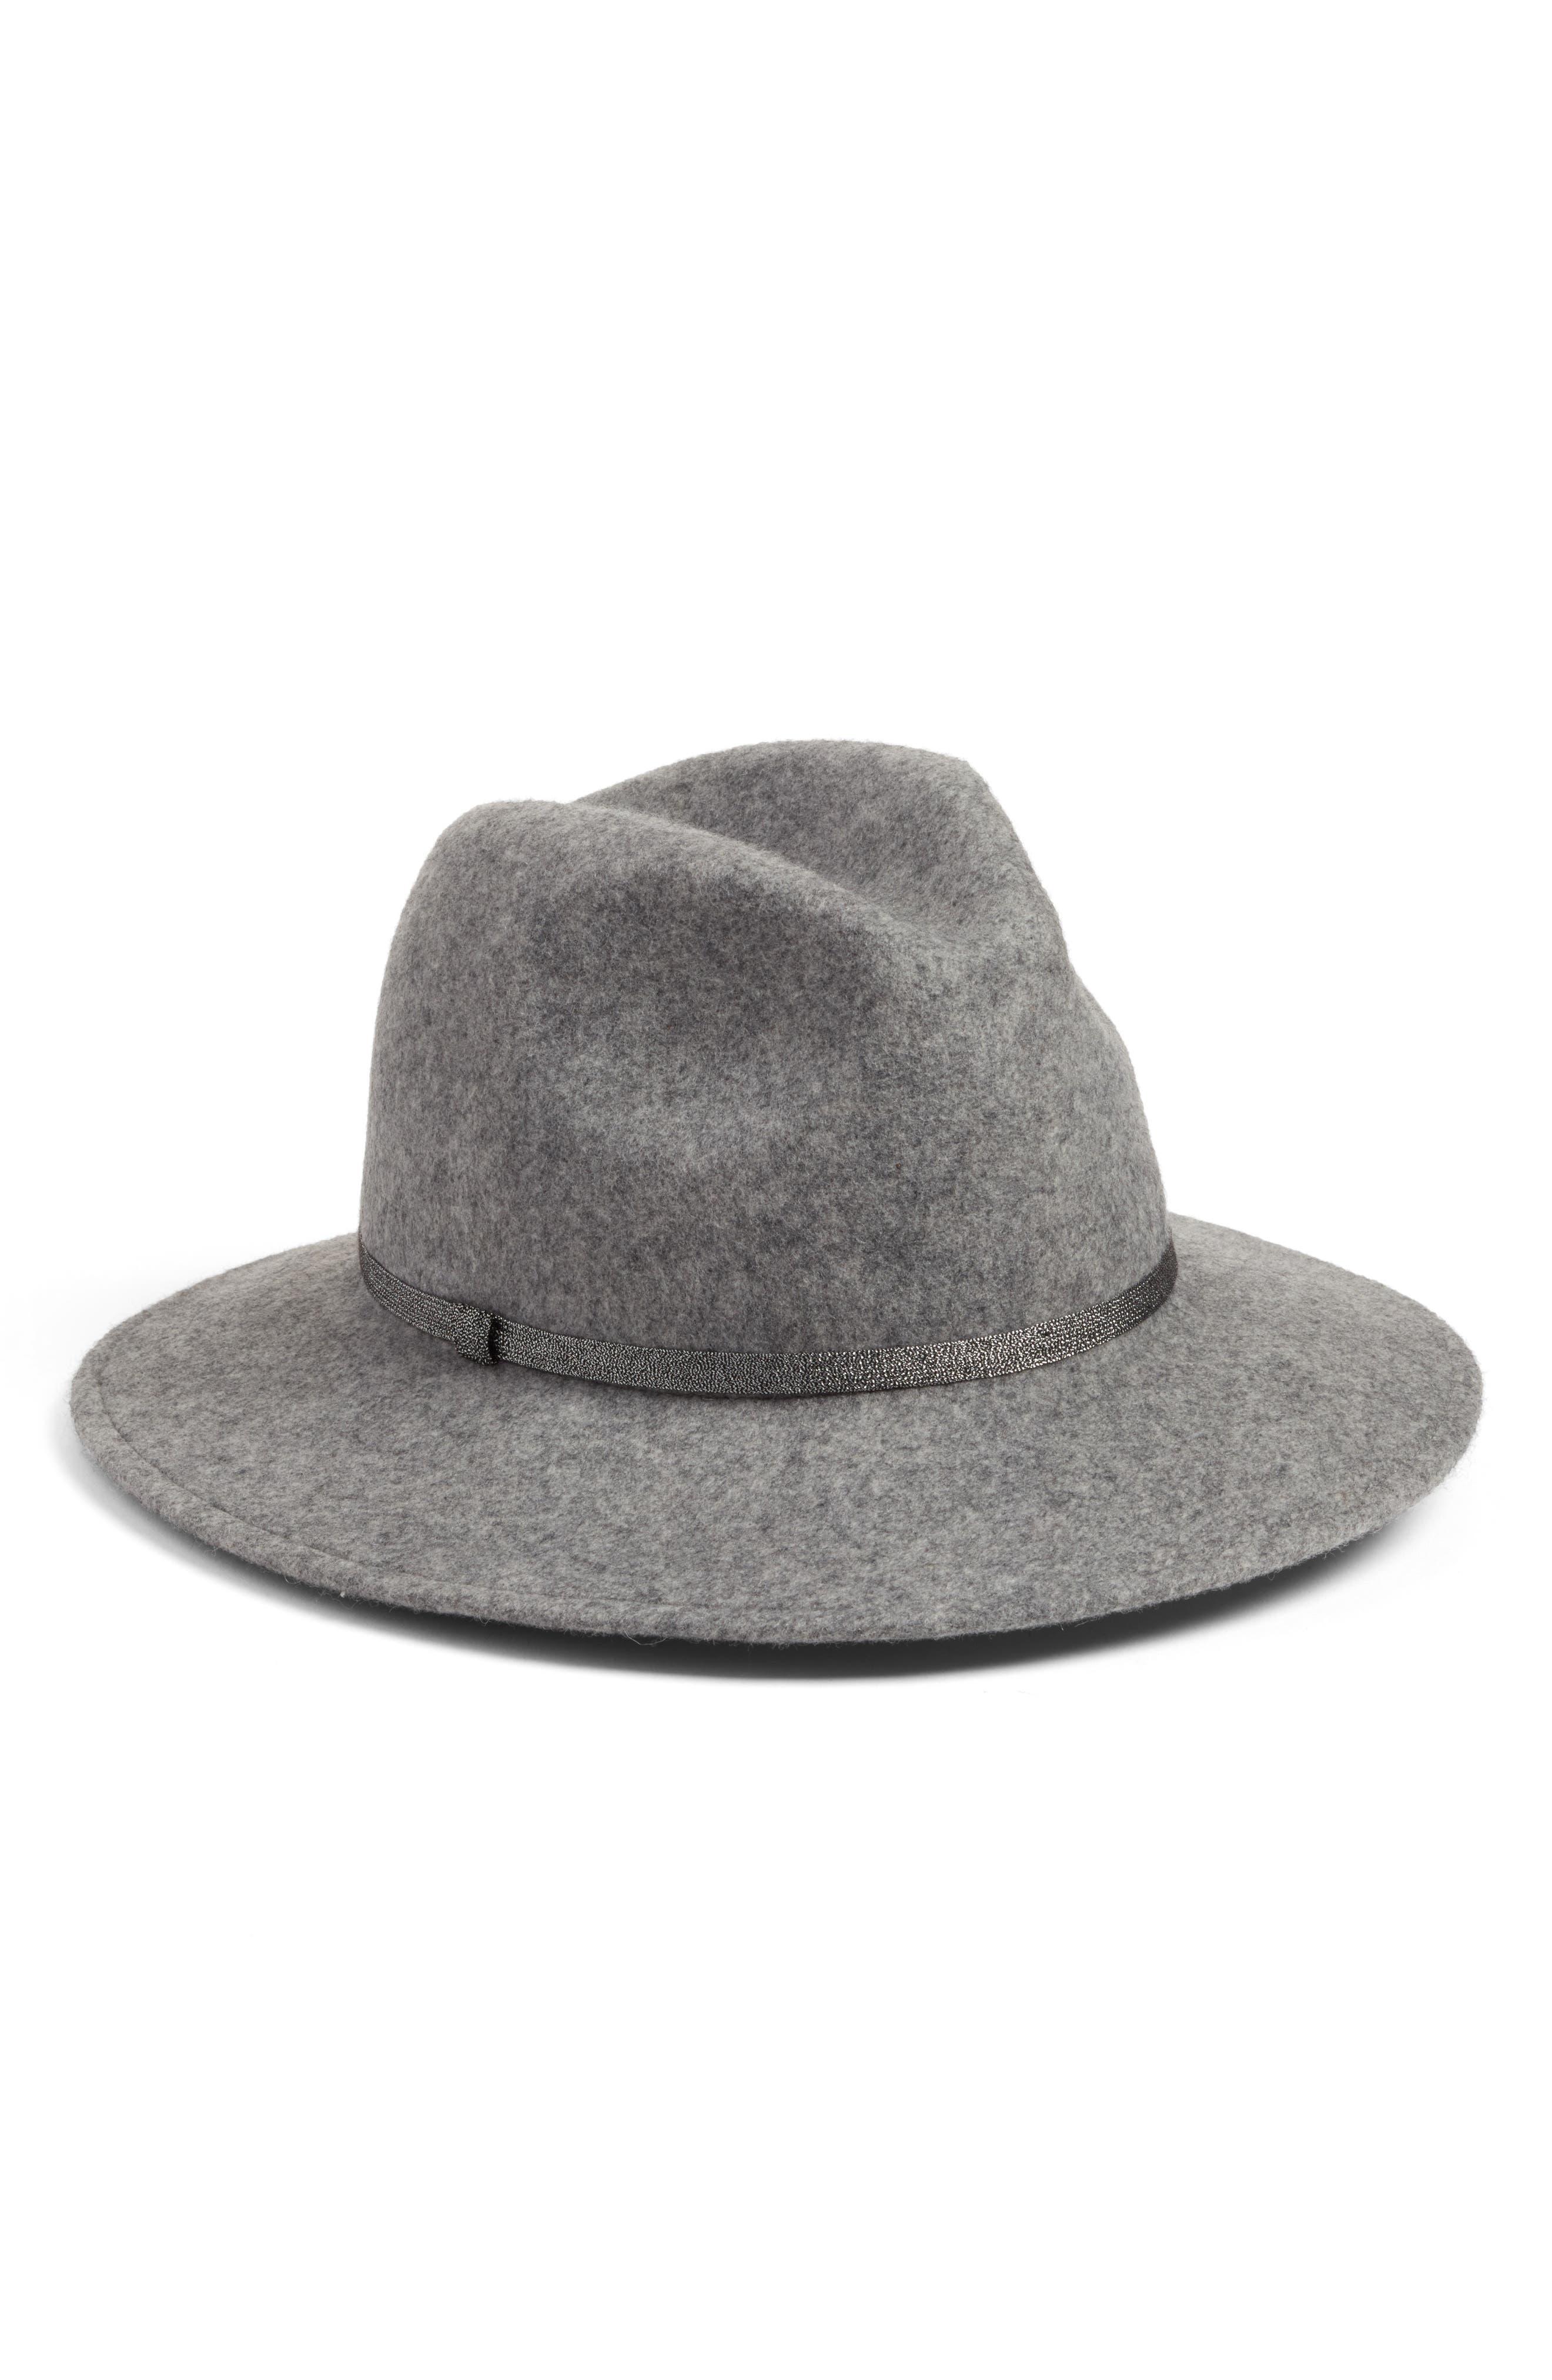 Alternate Image 1 Selected - Treasure & Bond Metallic Band Wool Felt Panama Hat